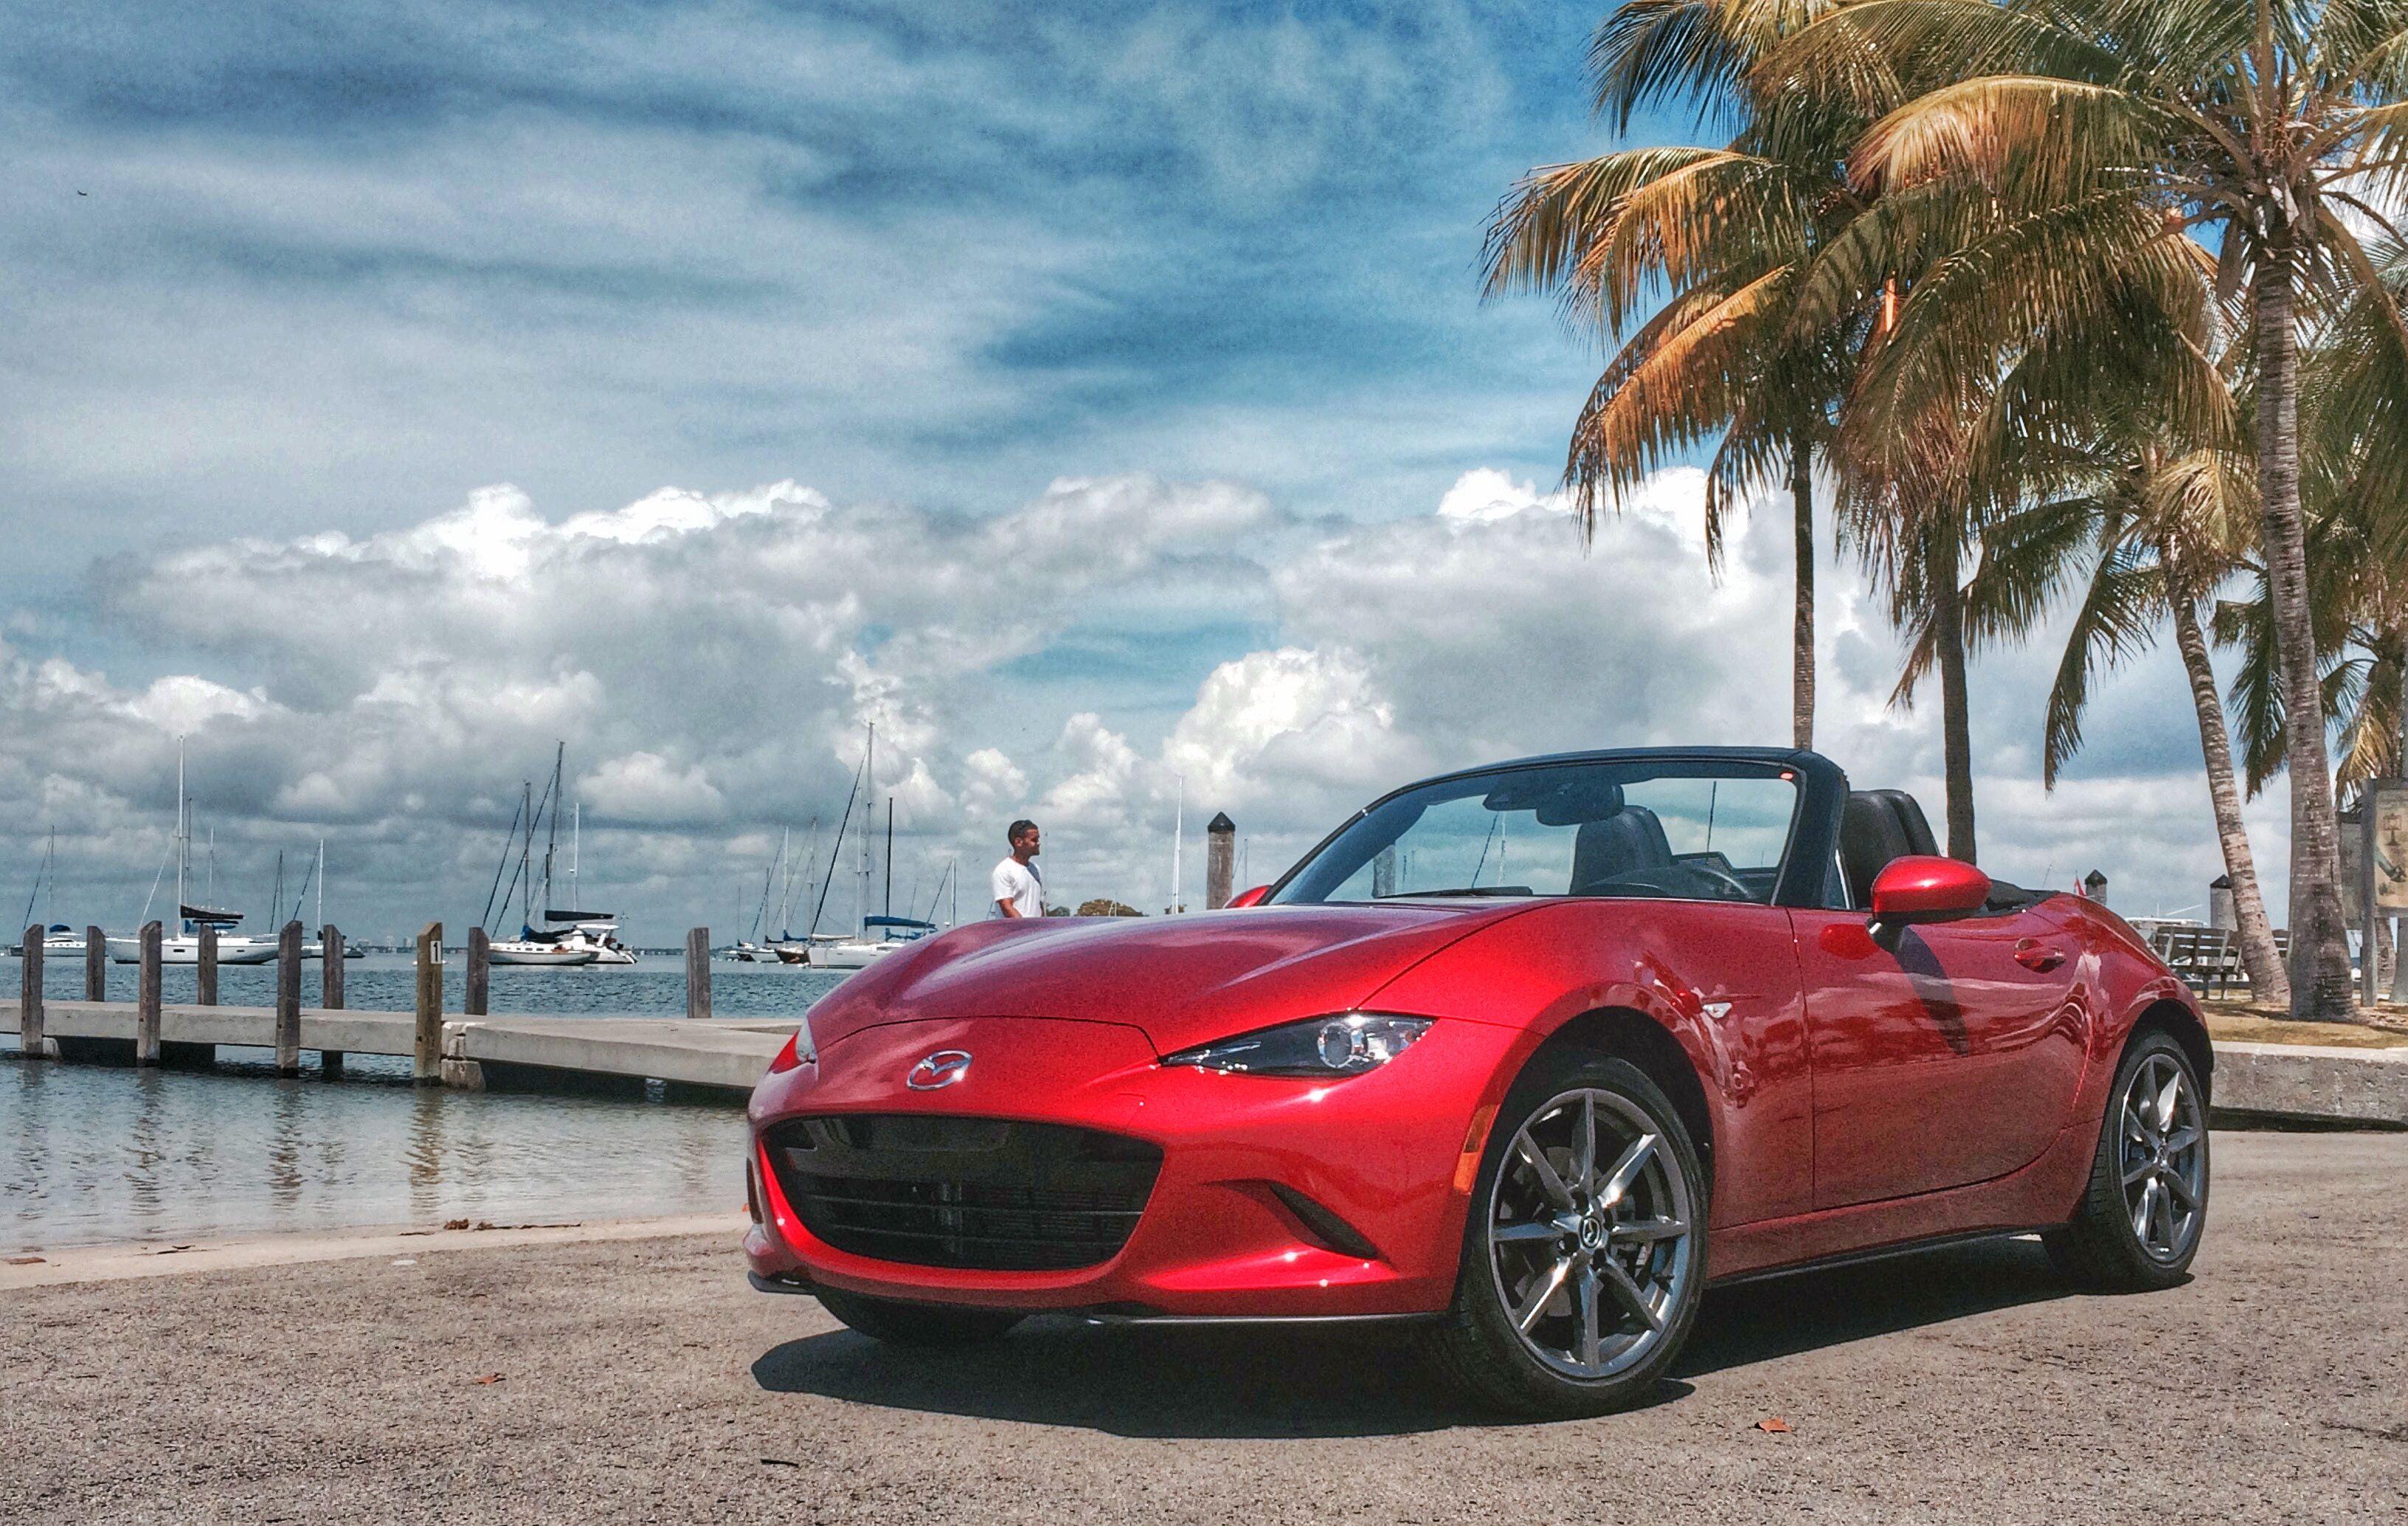 Exclusive 2016 Mazda MX5 First Drive Mazda mx5, Mazda